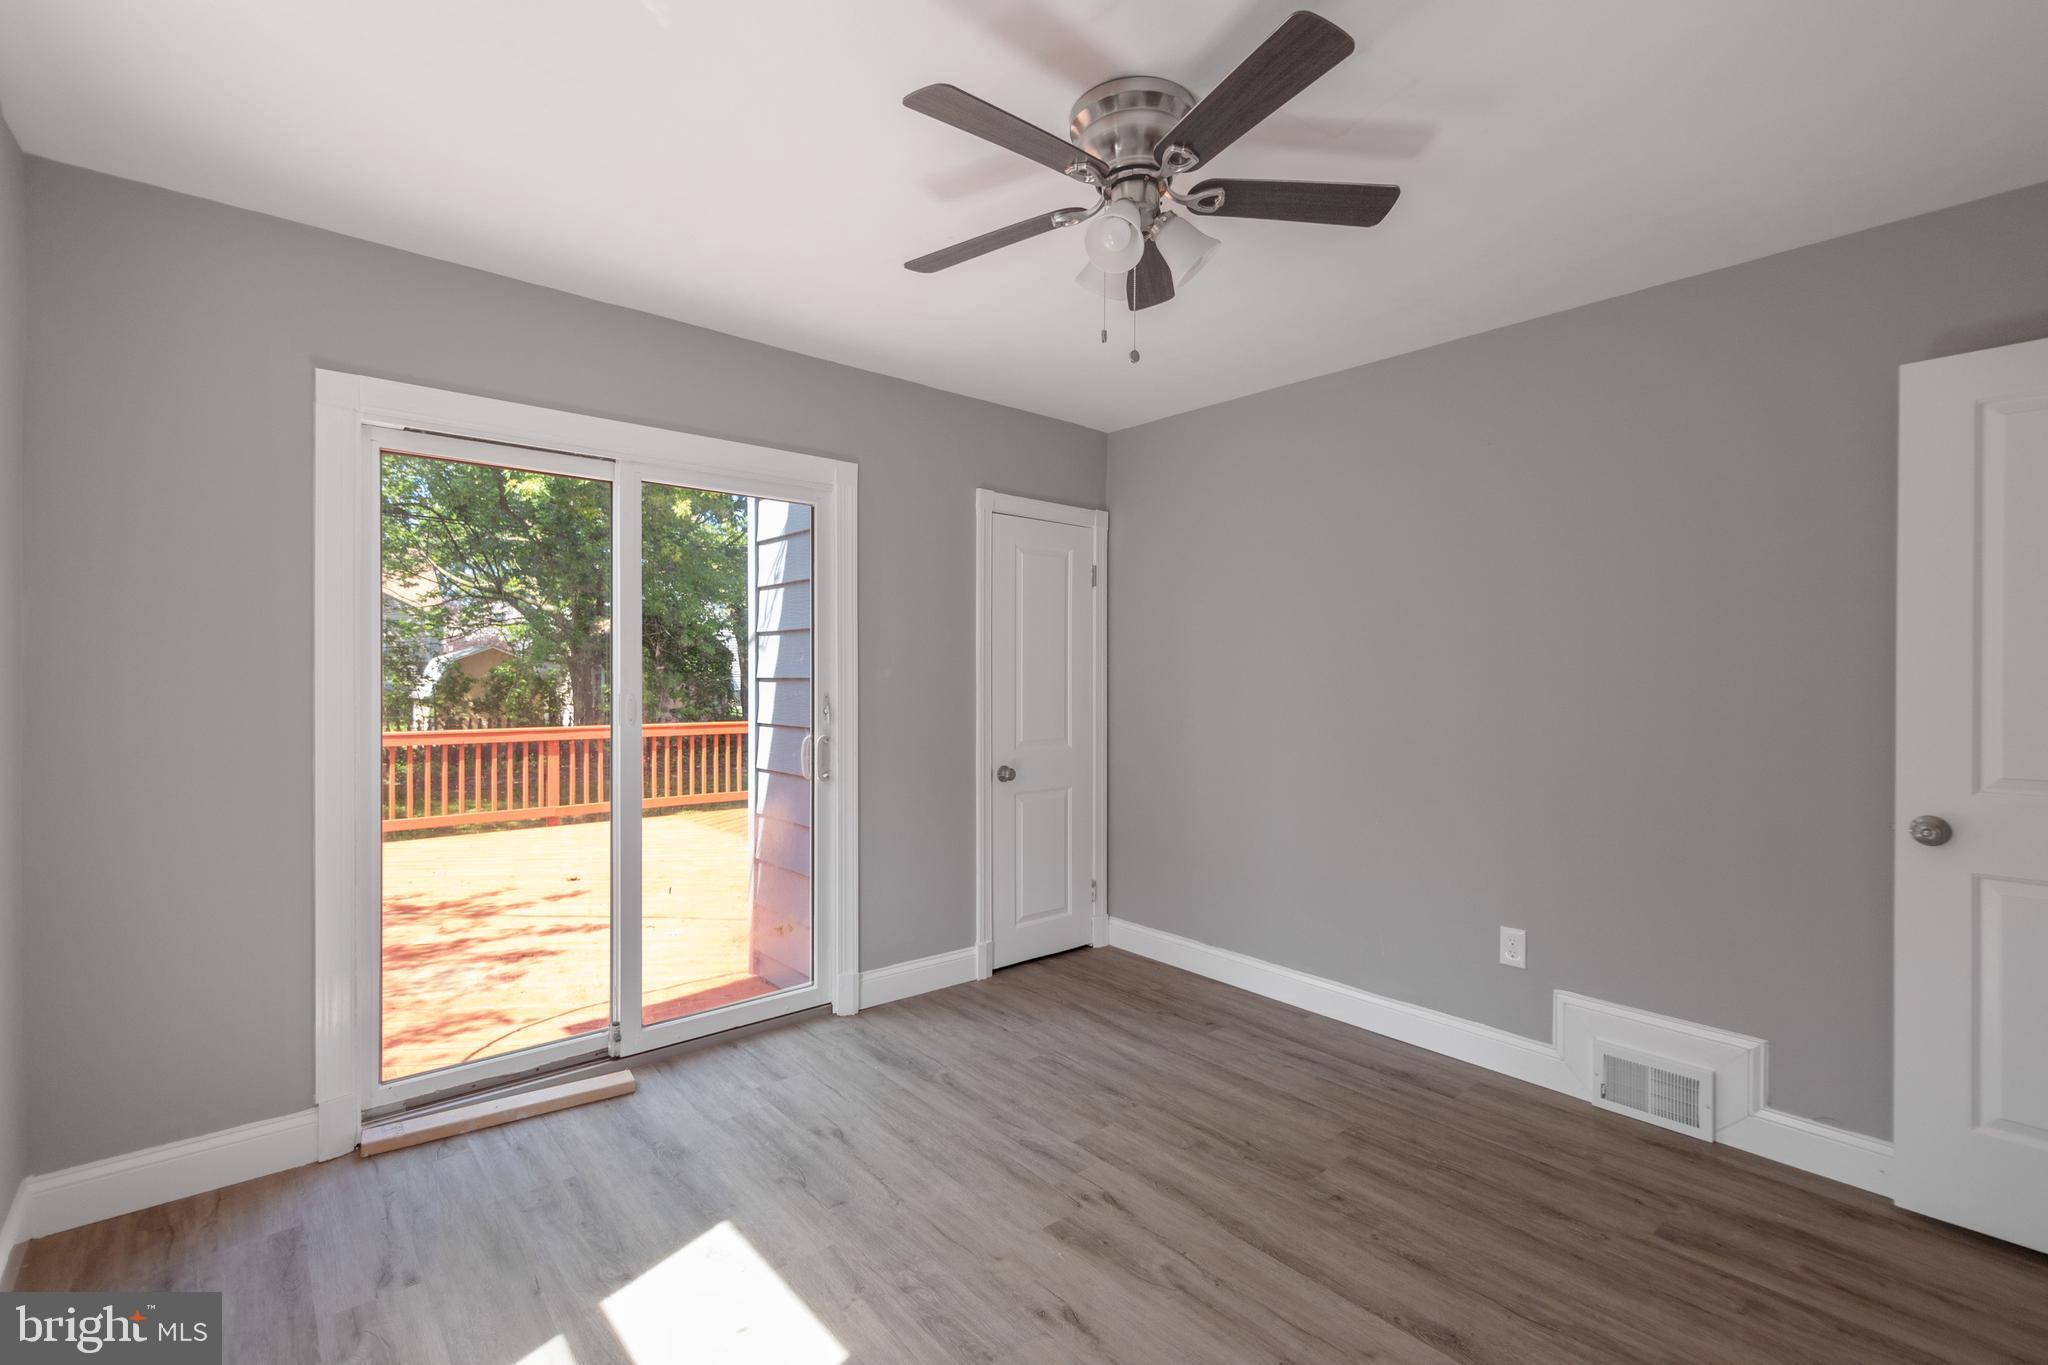 2709 GLENDALE ROAD, BALTIMORE, Maryland 21234, 4 Bedrooms Bedrooms, ,2 BathroomsBathrooms,Single Family,For Sale,2709 GLENDALE ROAD,MDBC525942